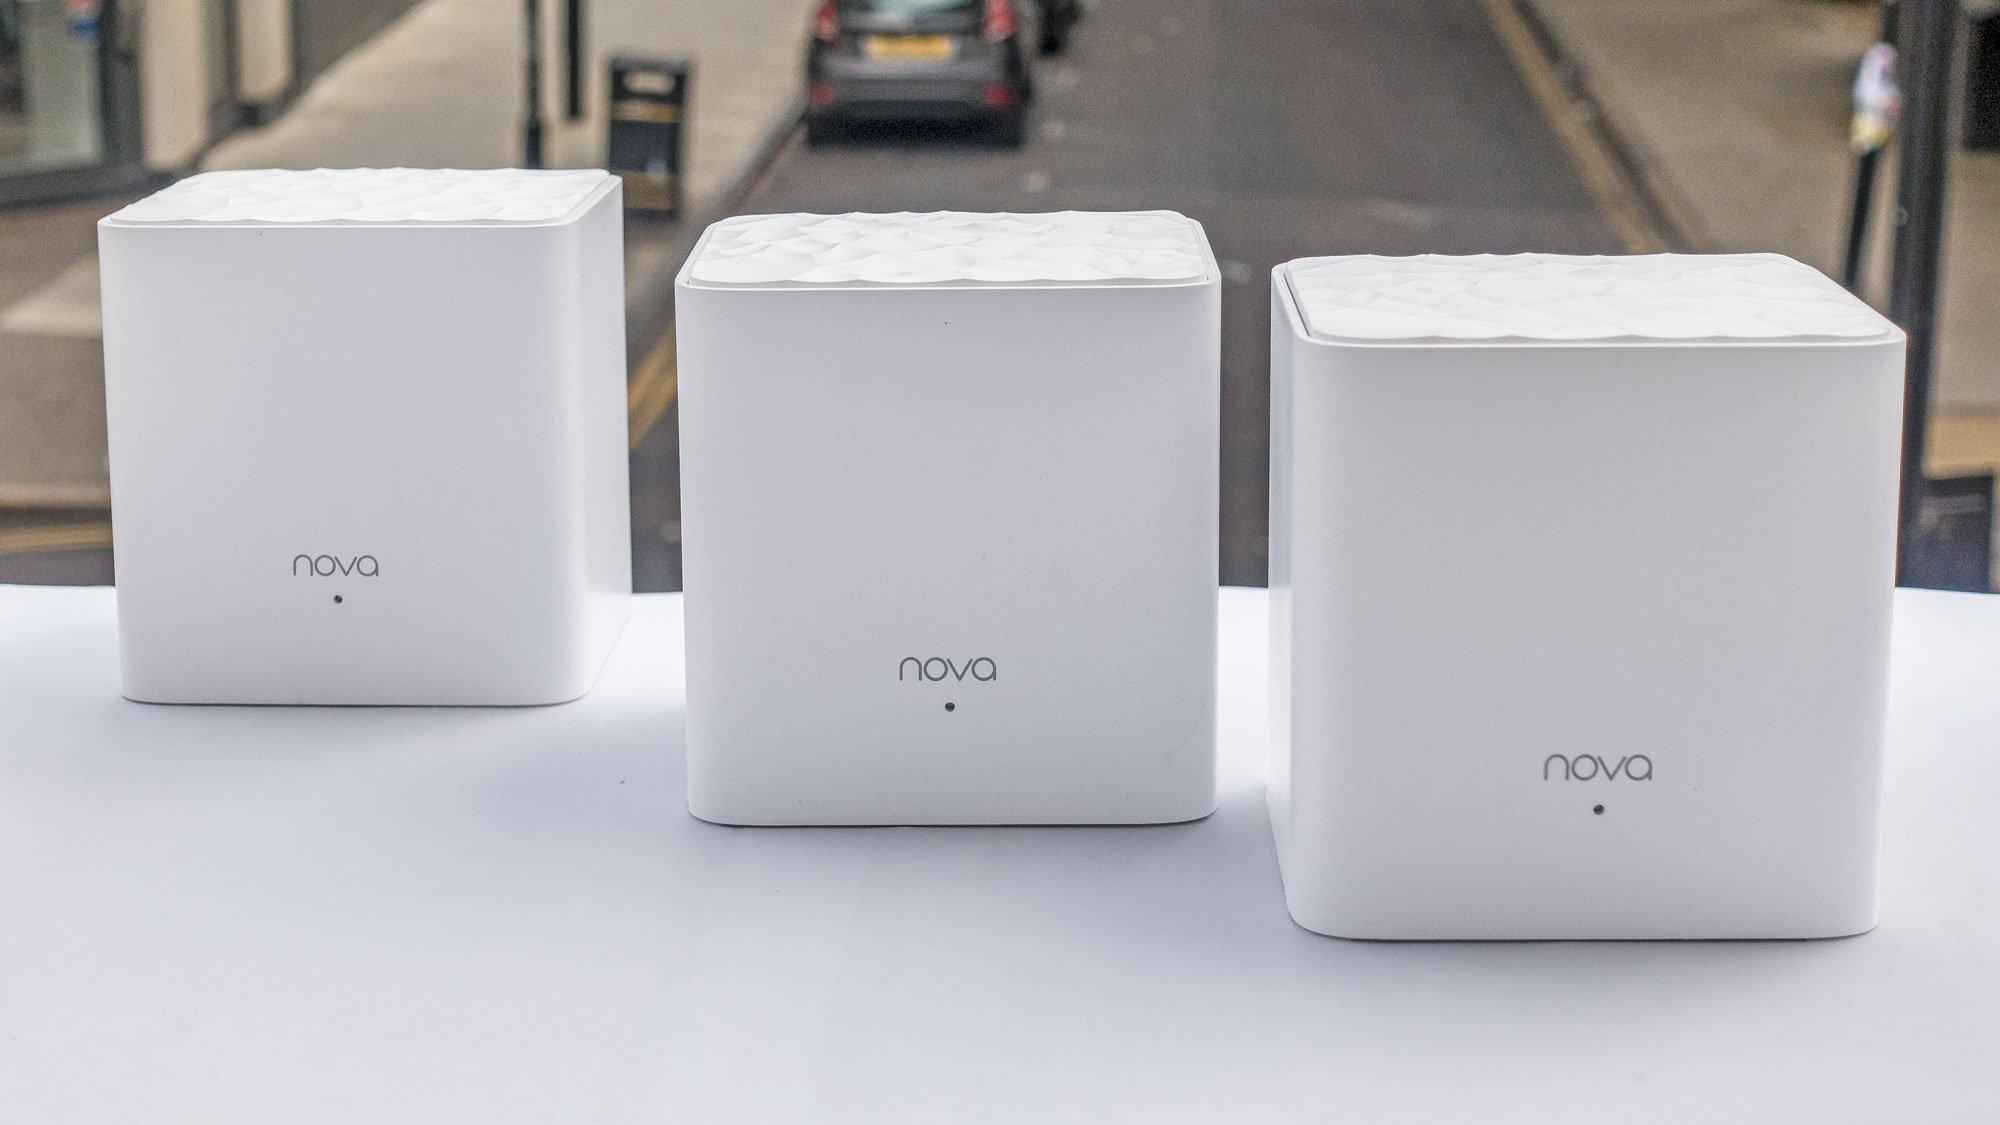 Tenda Nova MW3 review: Cheap but very cheerful mesh Wi-Fi | Expert